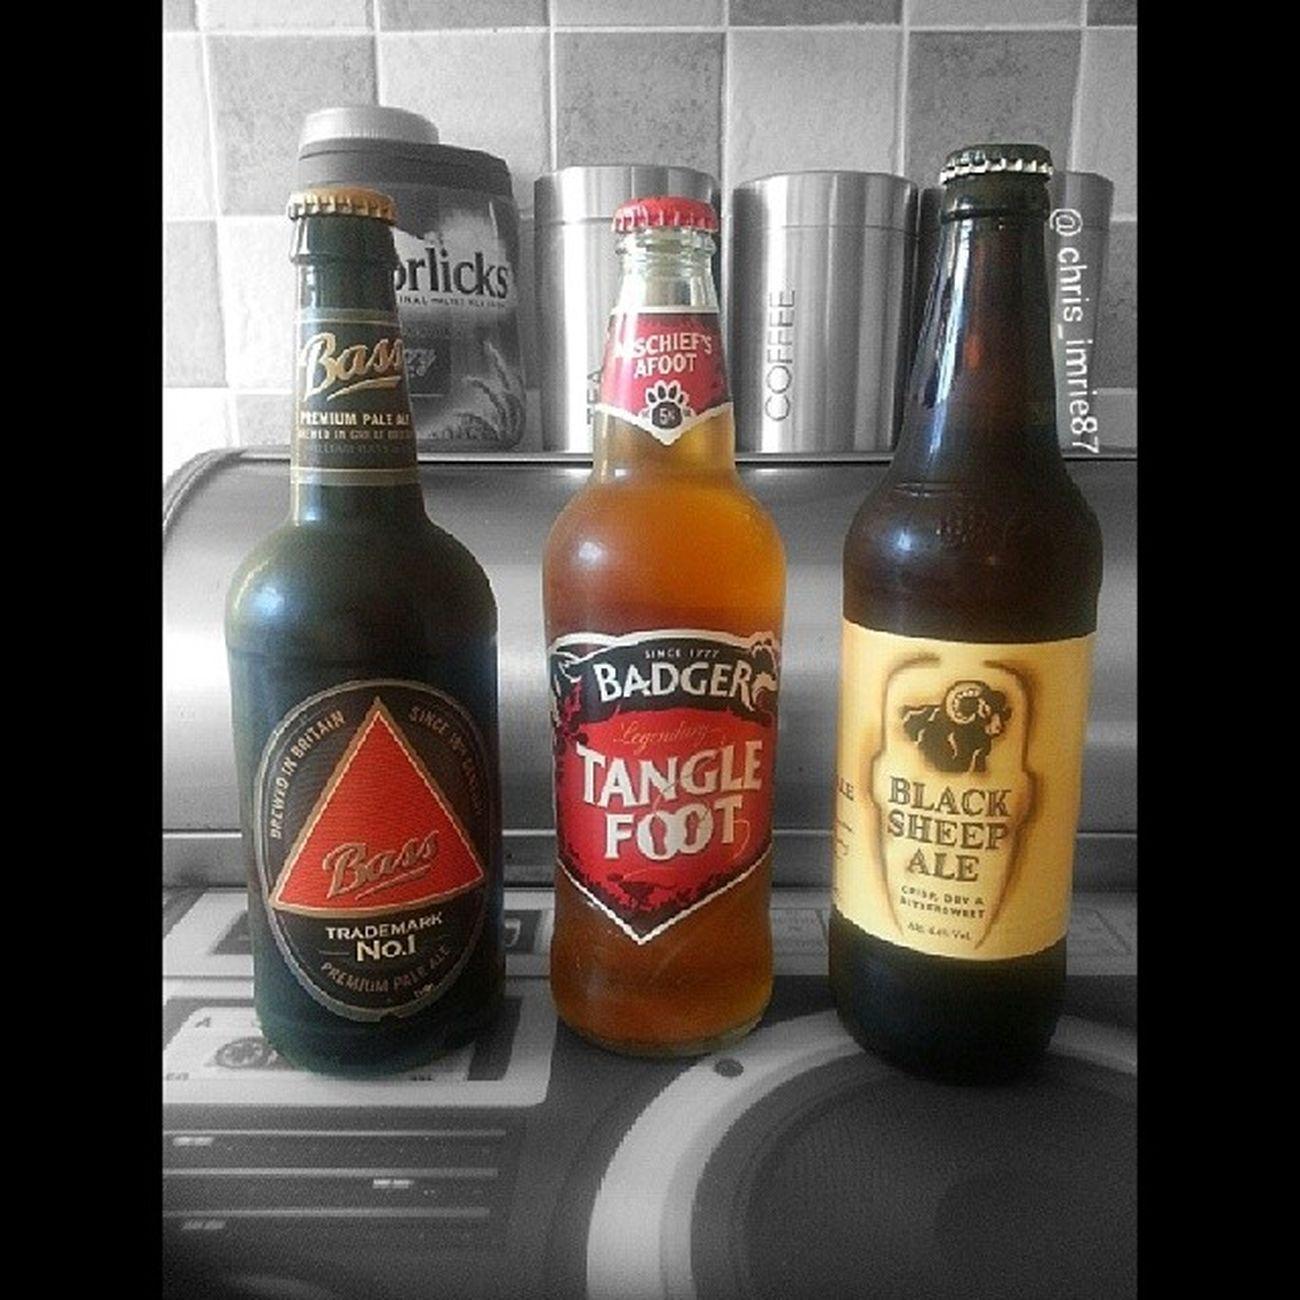 Trying some new beers tonight, enjoy your weekend and stay safe :) HeresToTheWeekend Saturday Saturdaynight Bass PremiumPaleAle Paleale Badger MischiefsAfoot Tanglefoot Blacksheep Ale Blacksheepale Britishbeer